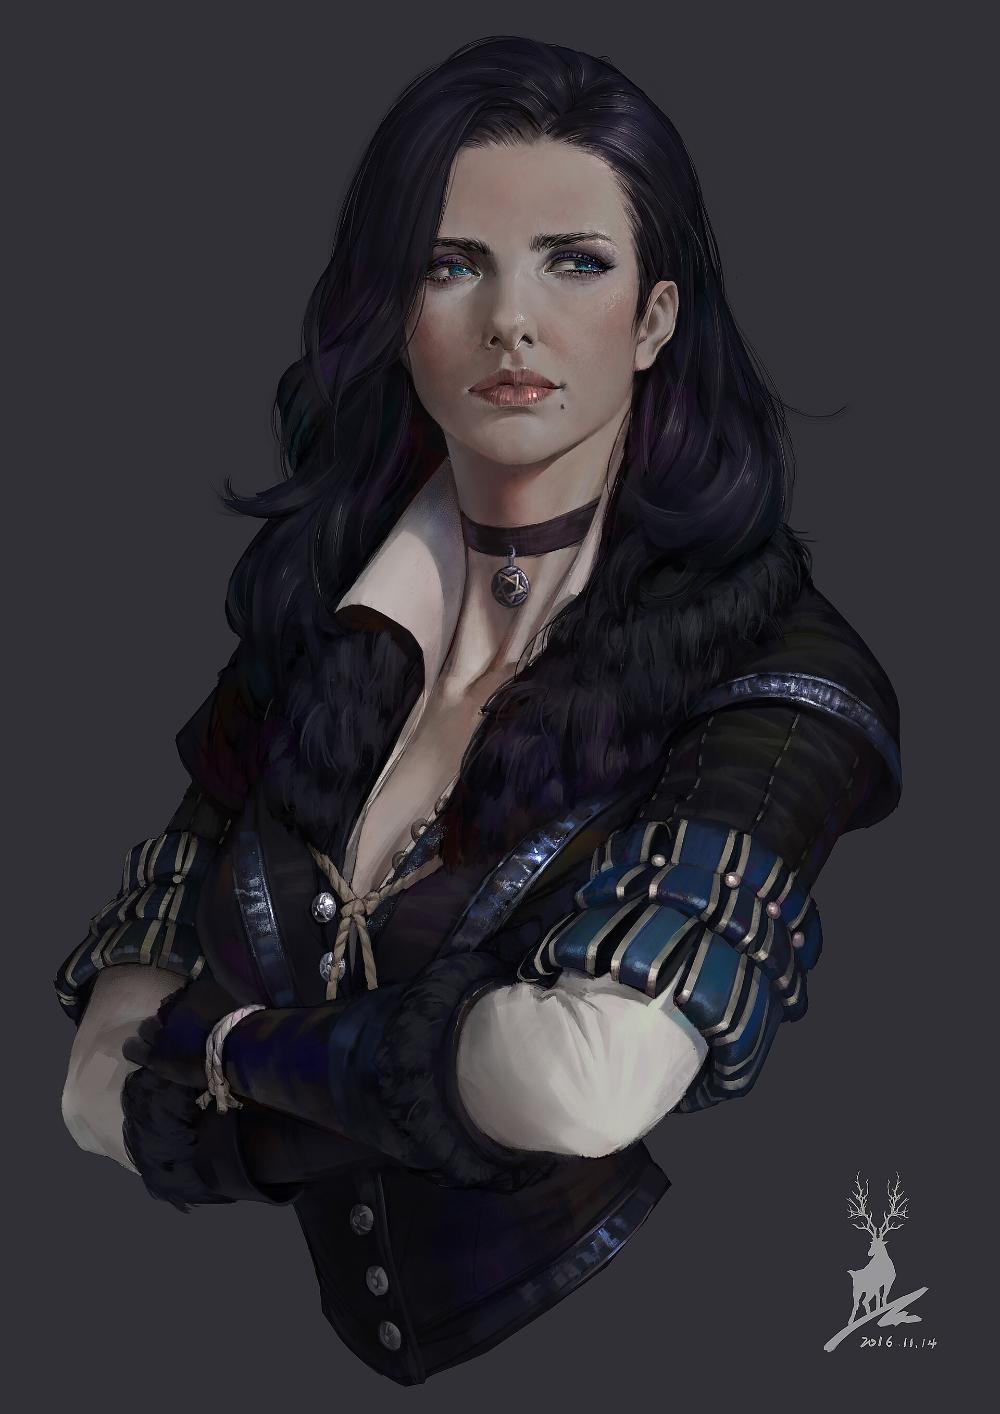 Fantasy Art Picks Of The Day 415 By Barosus On Deviantart The Witcher Game The Witcher Witcher Art